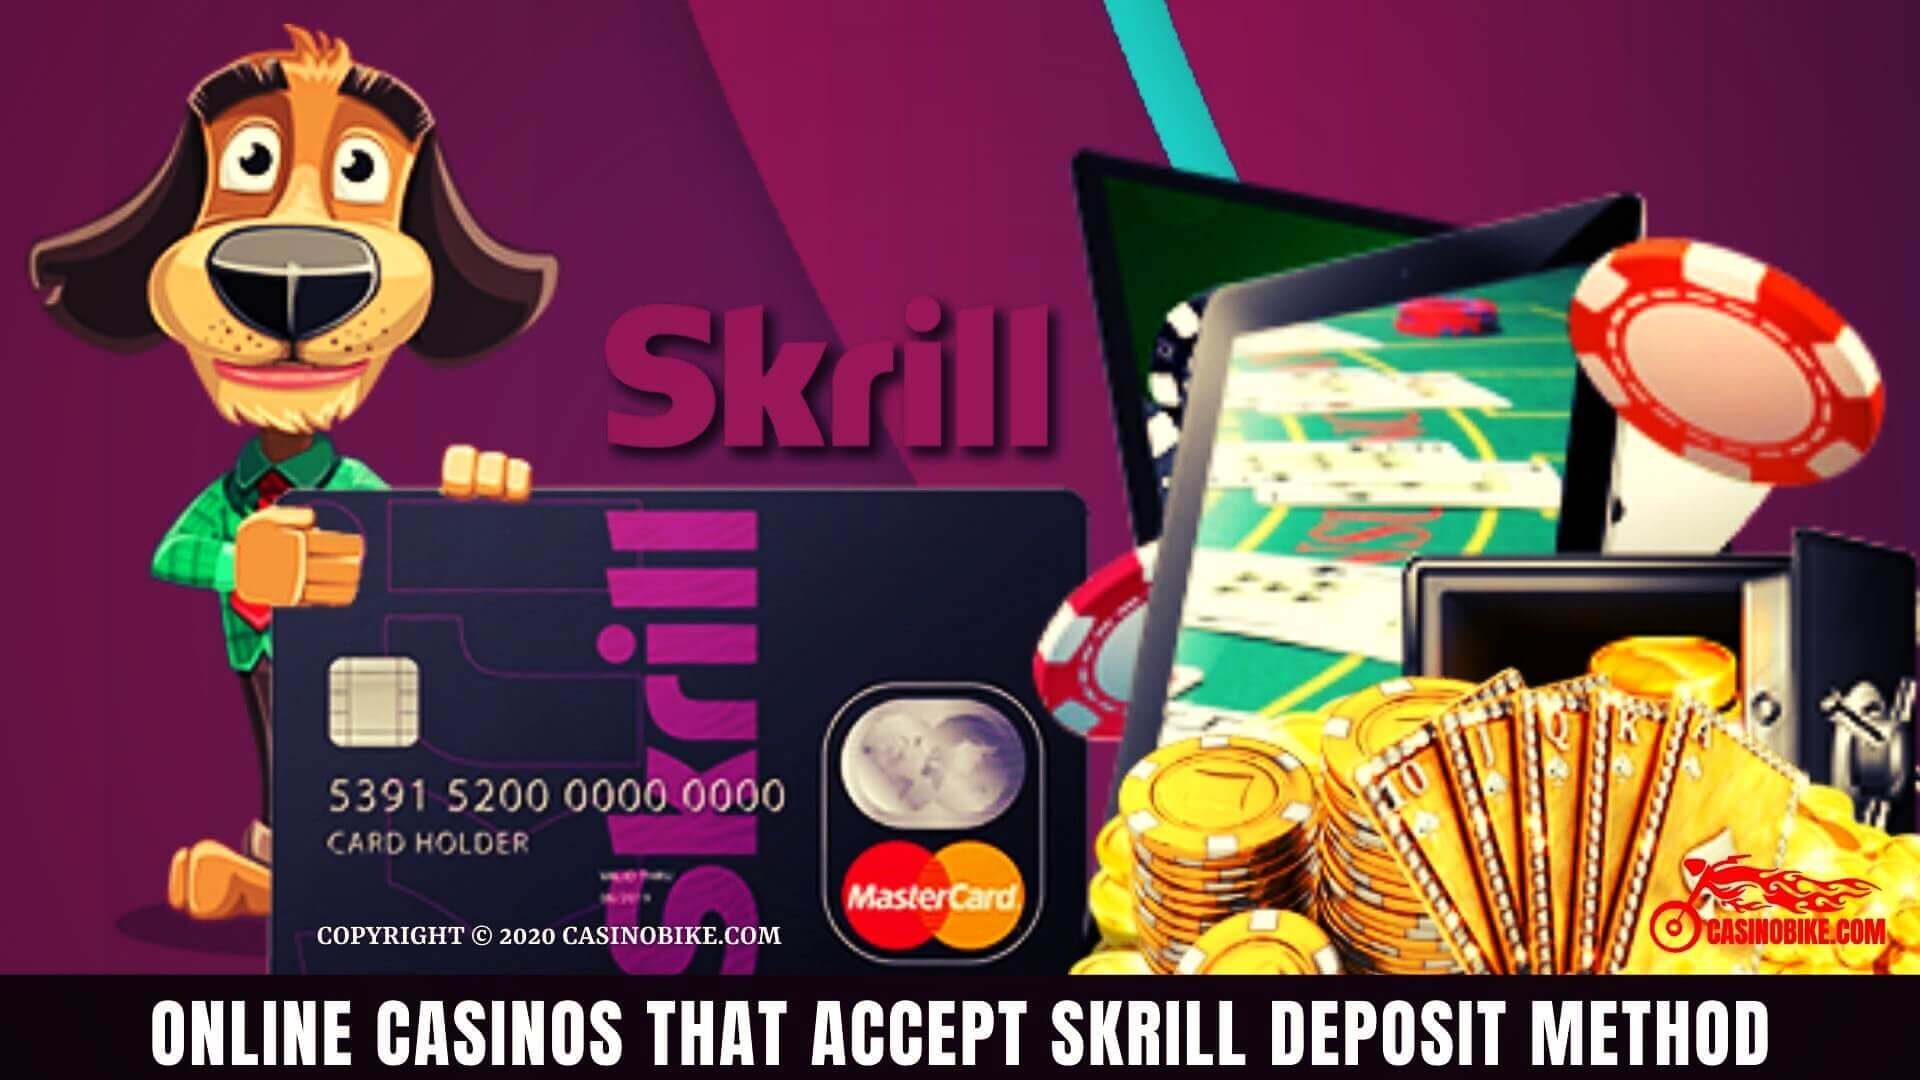 Best online casinos that accept skrill deposit method